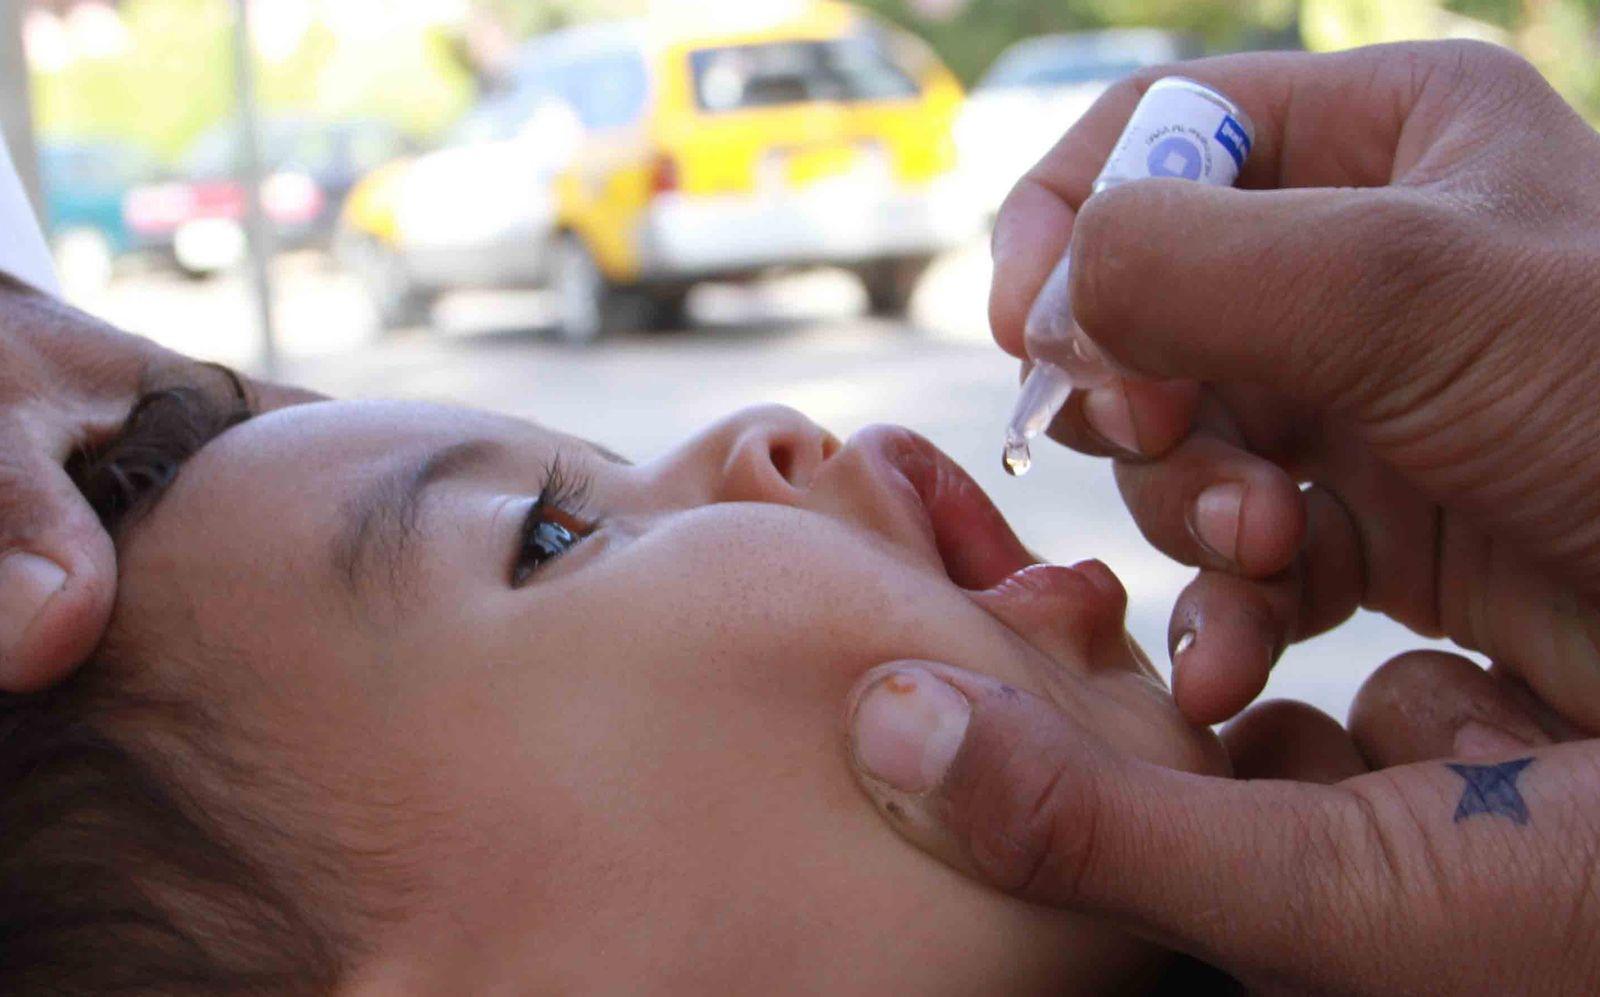 Welt-Poliotag / Polio Impfung / Afghanistan